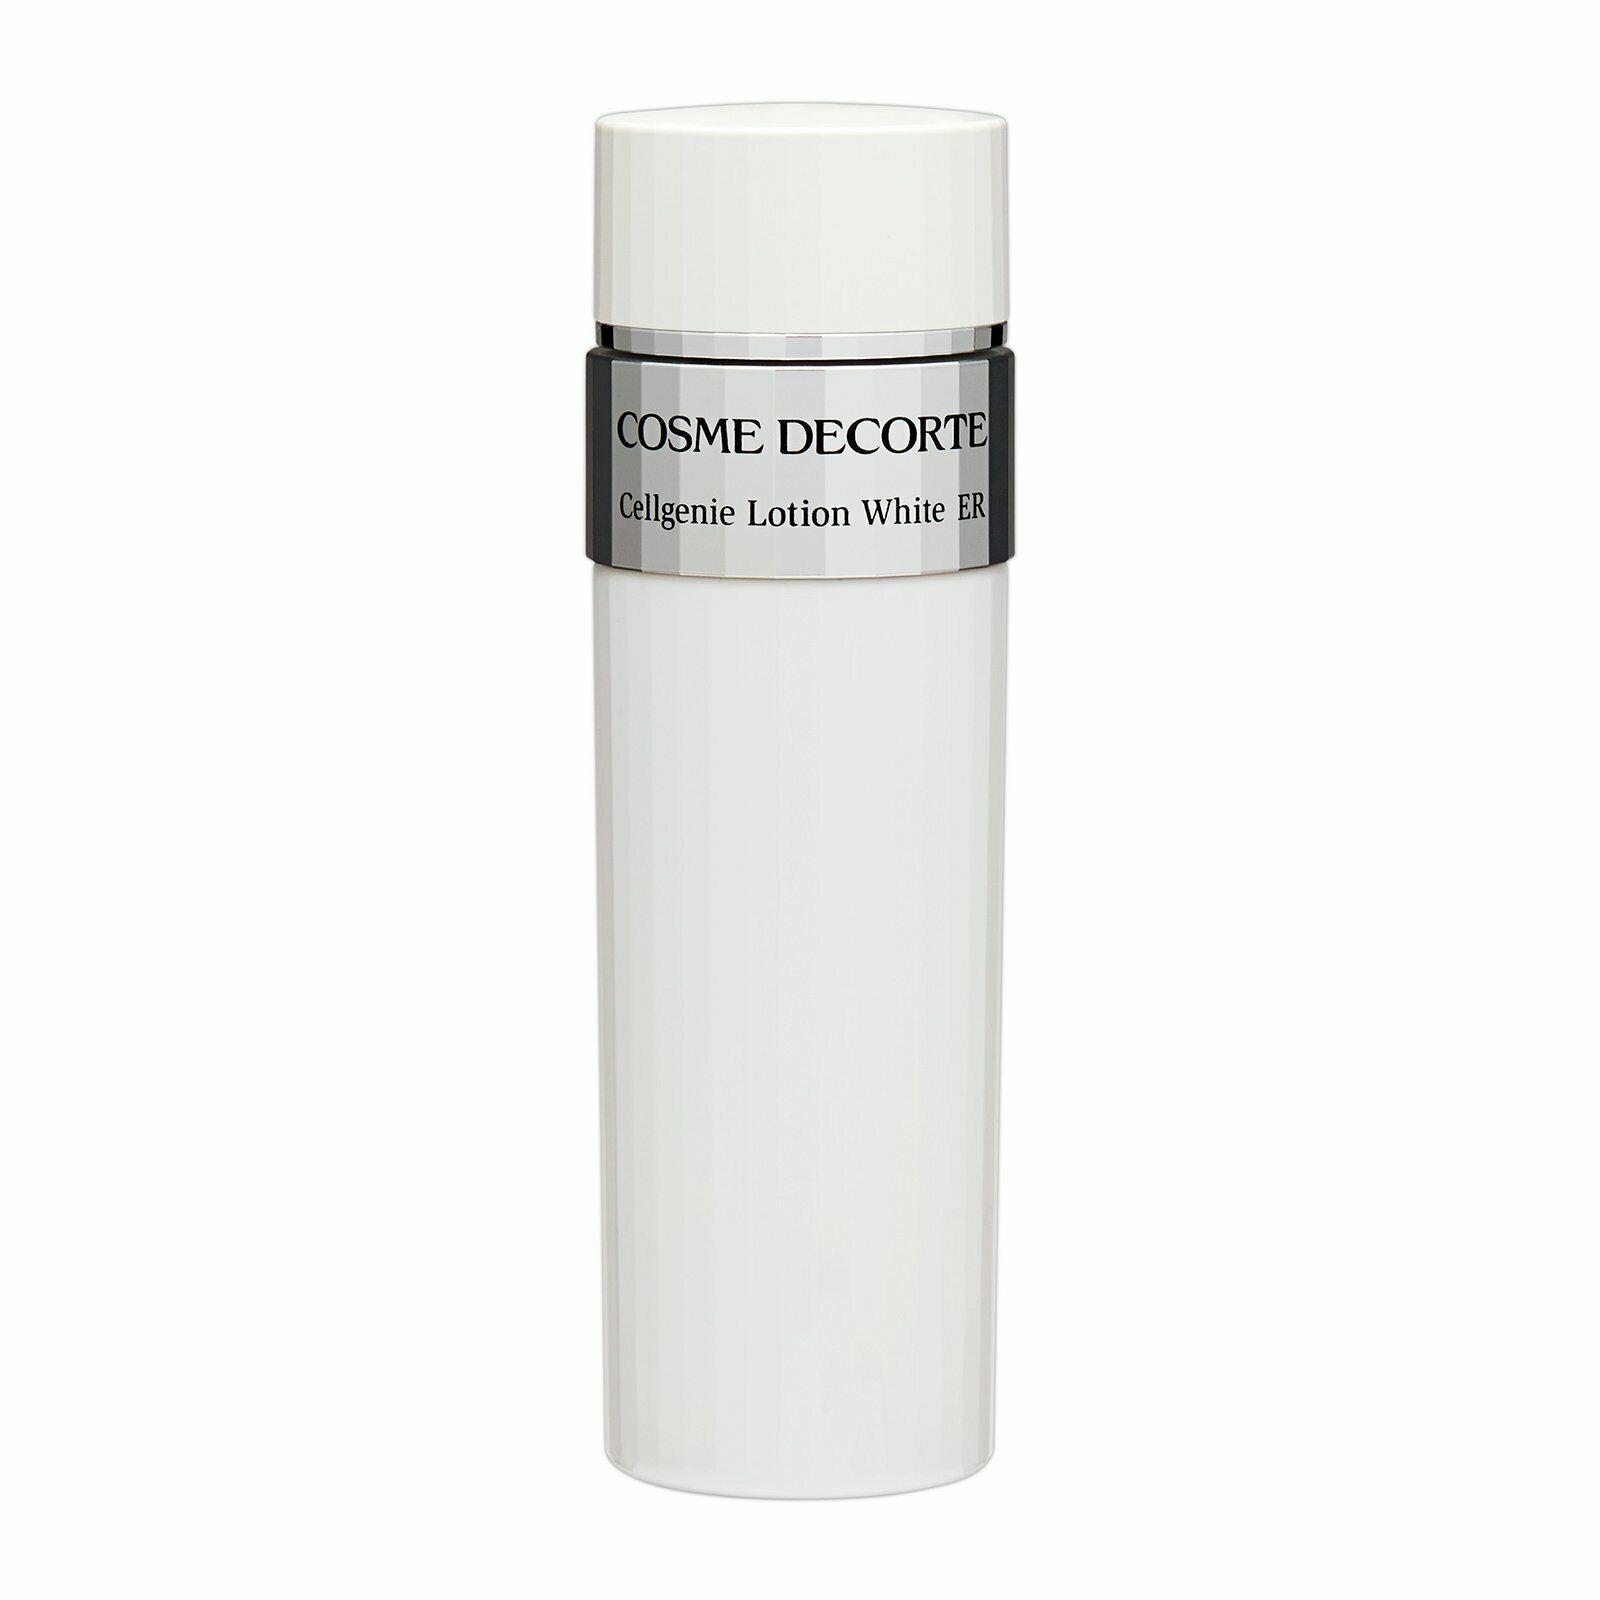 Cosme Decorte Cellgenie Lotion White ER